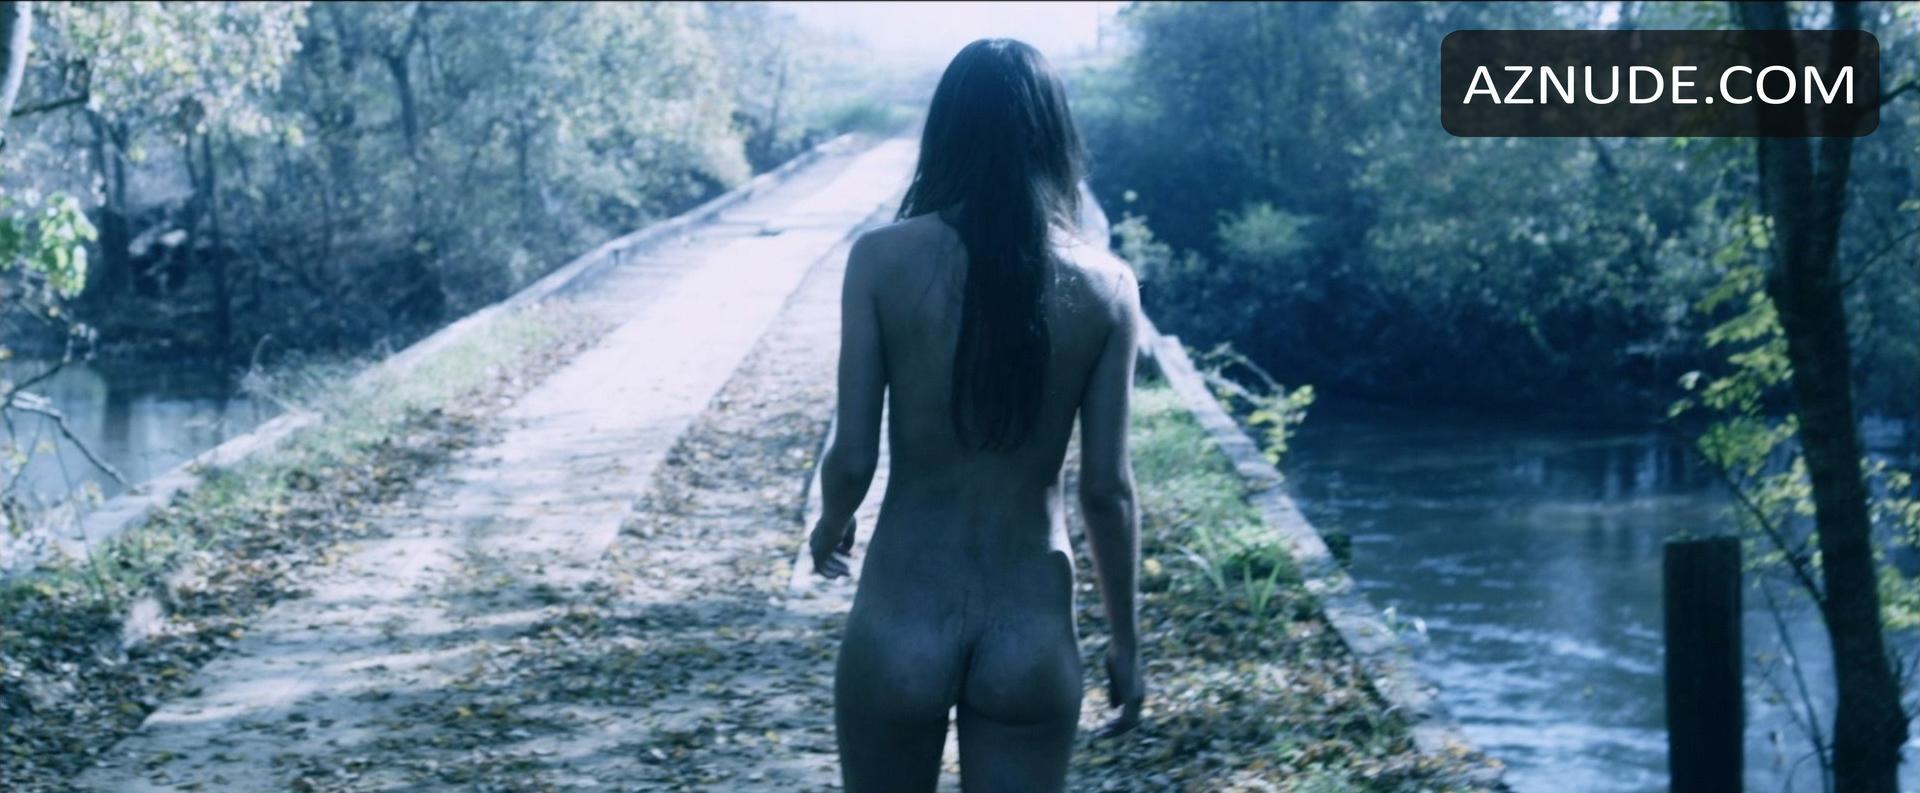 Topless India Reynolds. 2018-2019 celebrityes photos leaks! foto